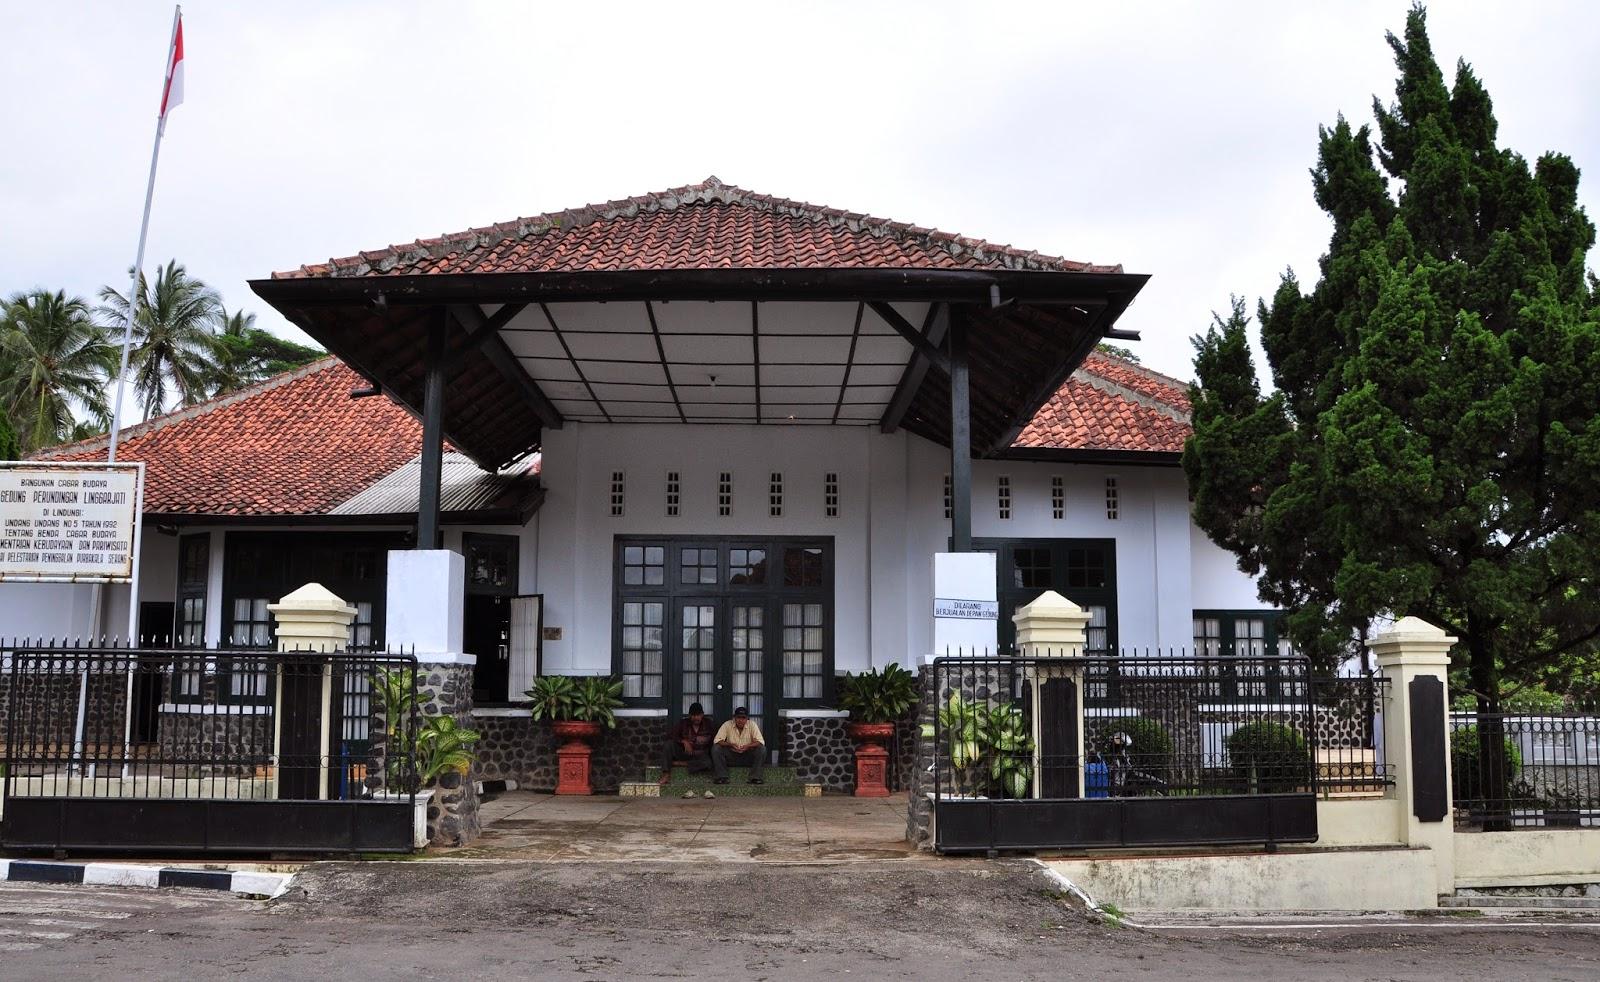 Daftar Tempat Wisata Kuningan Jawa Barat Yang Menarik